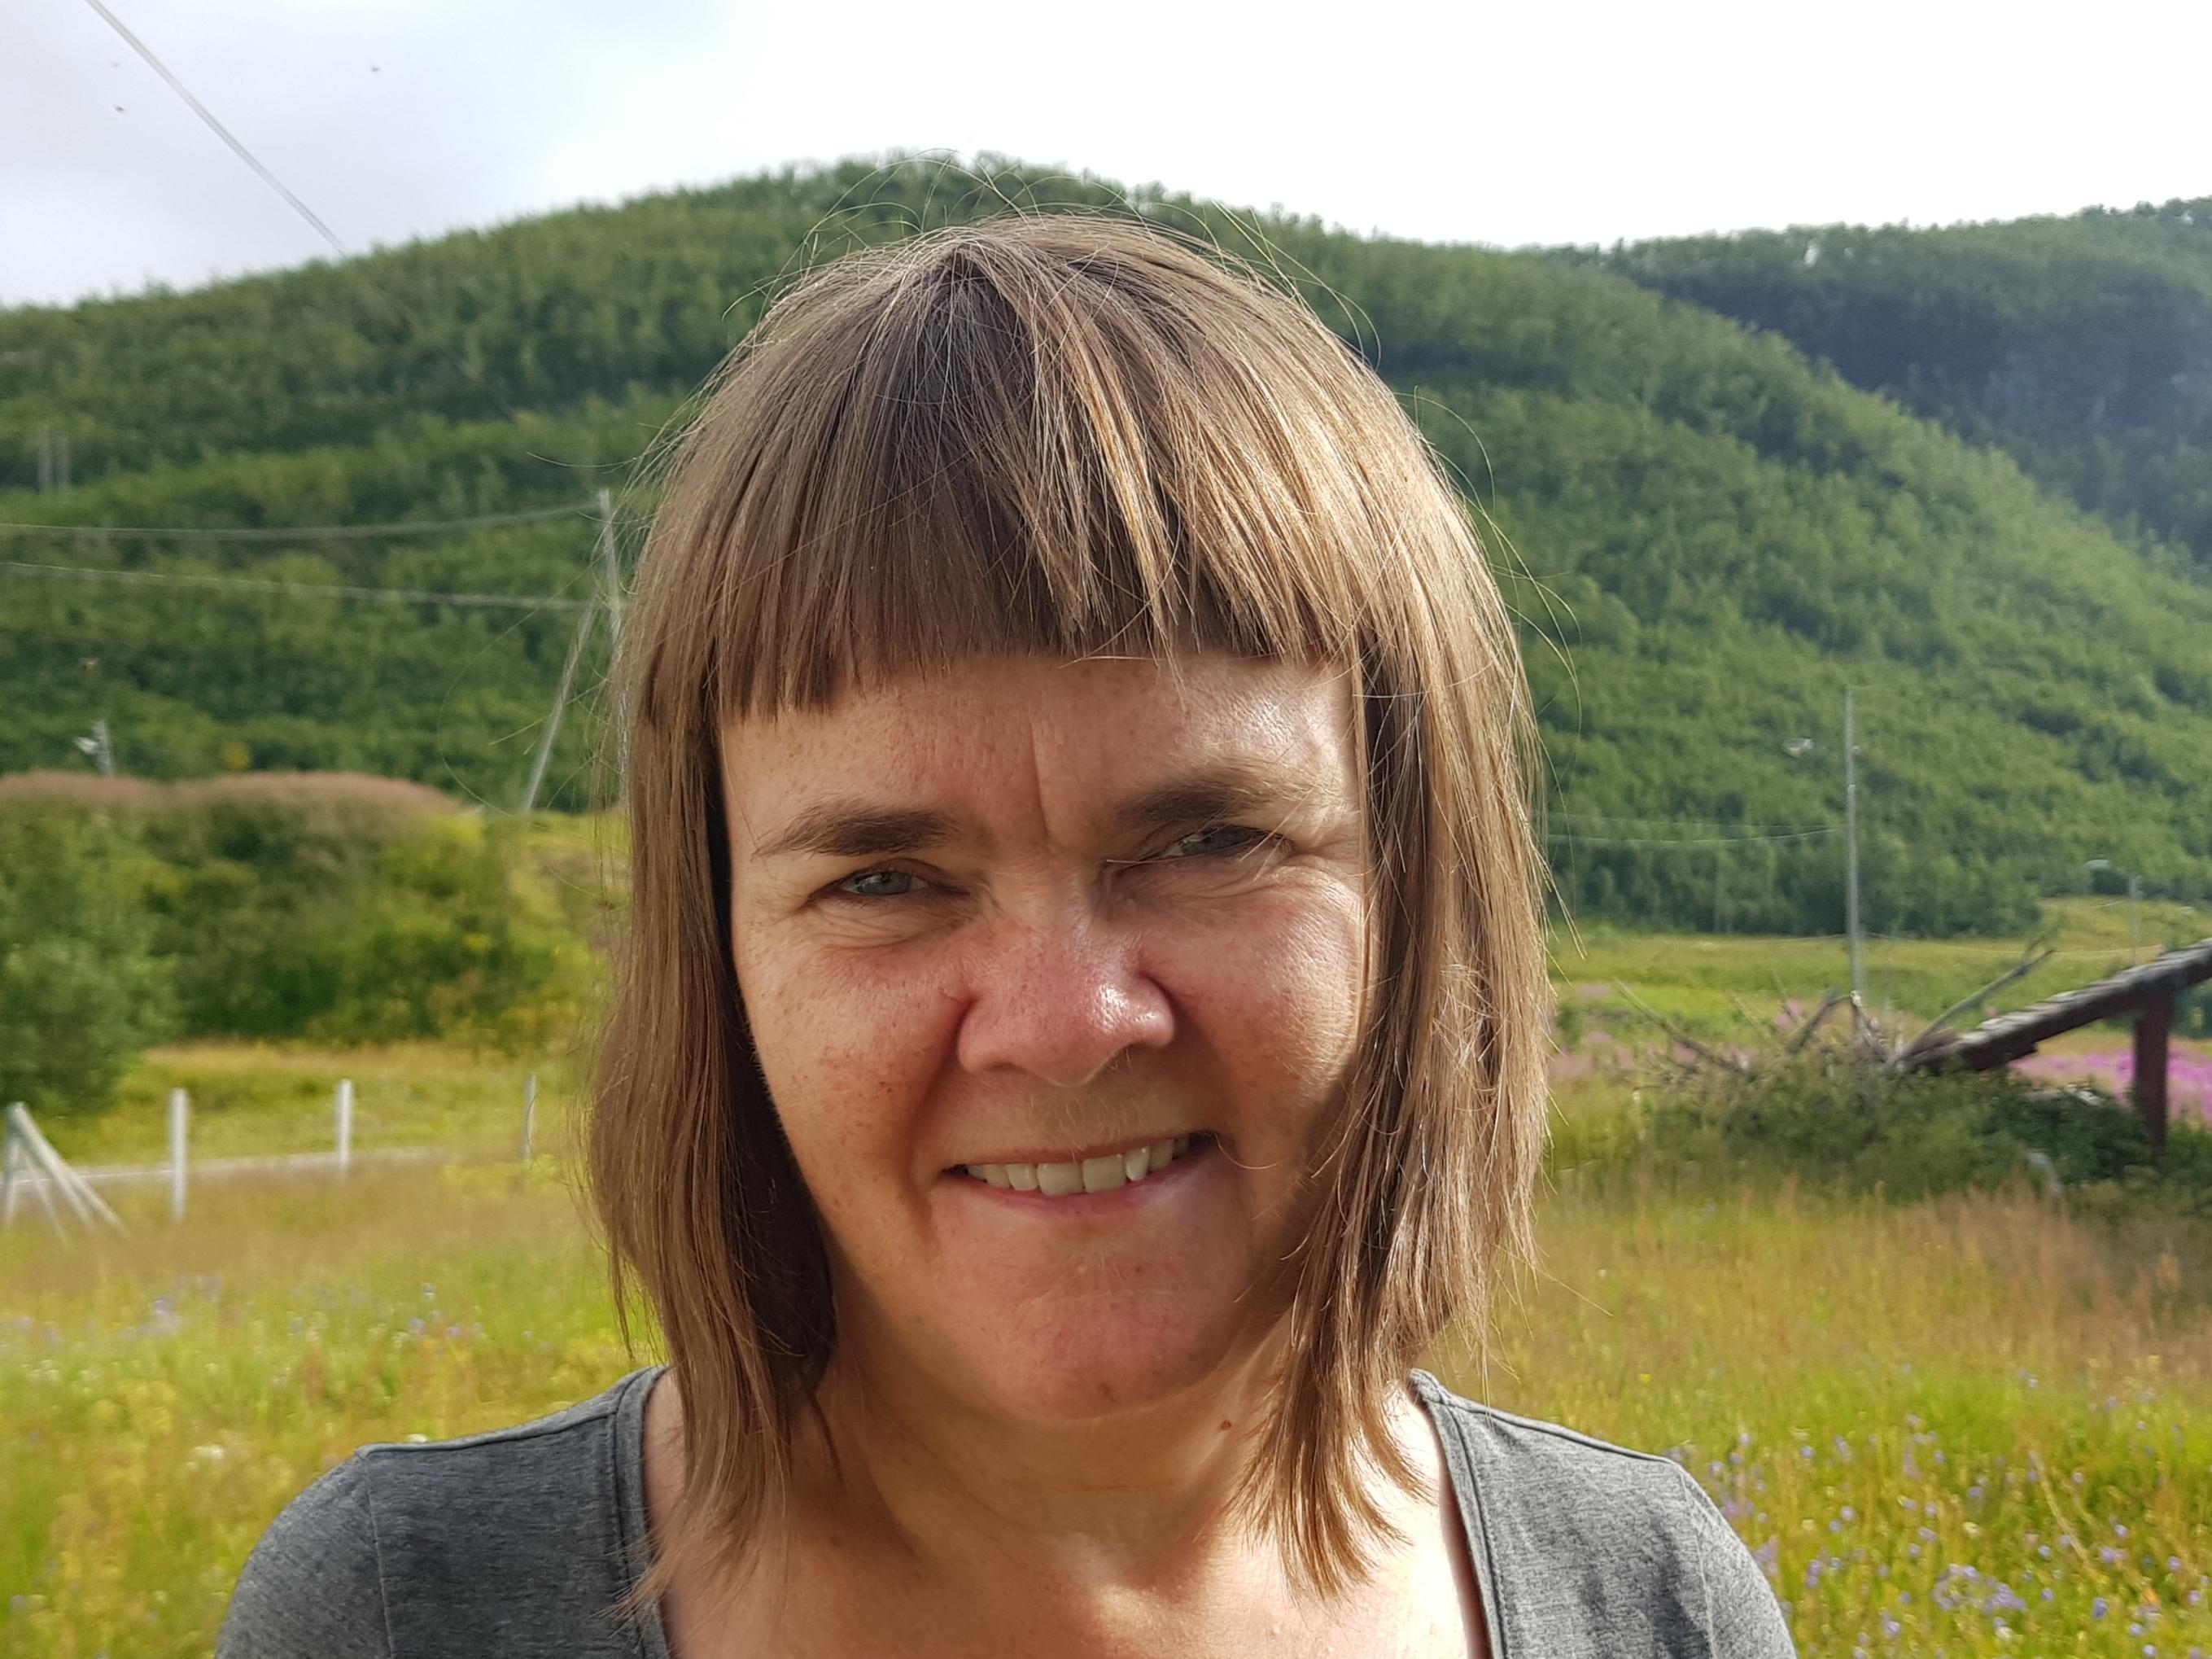 Mona Benedicte Steffensen